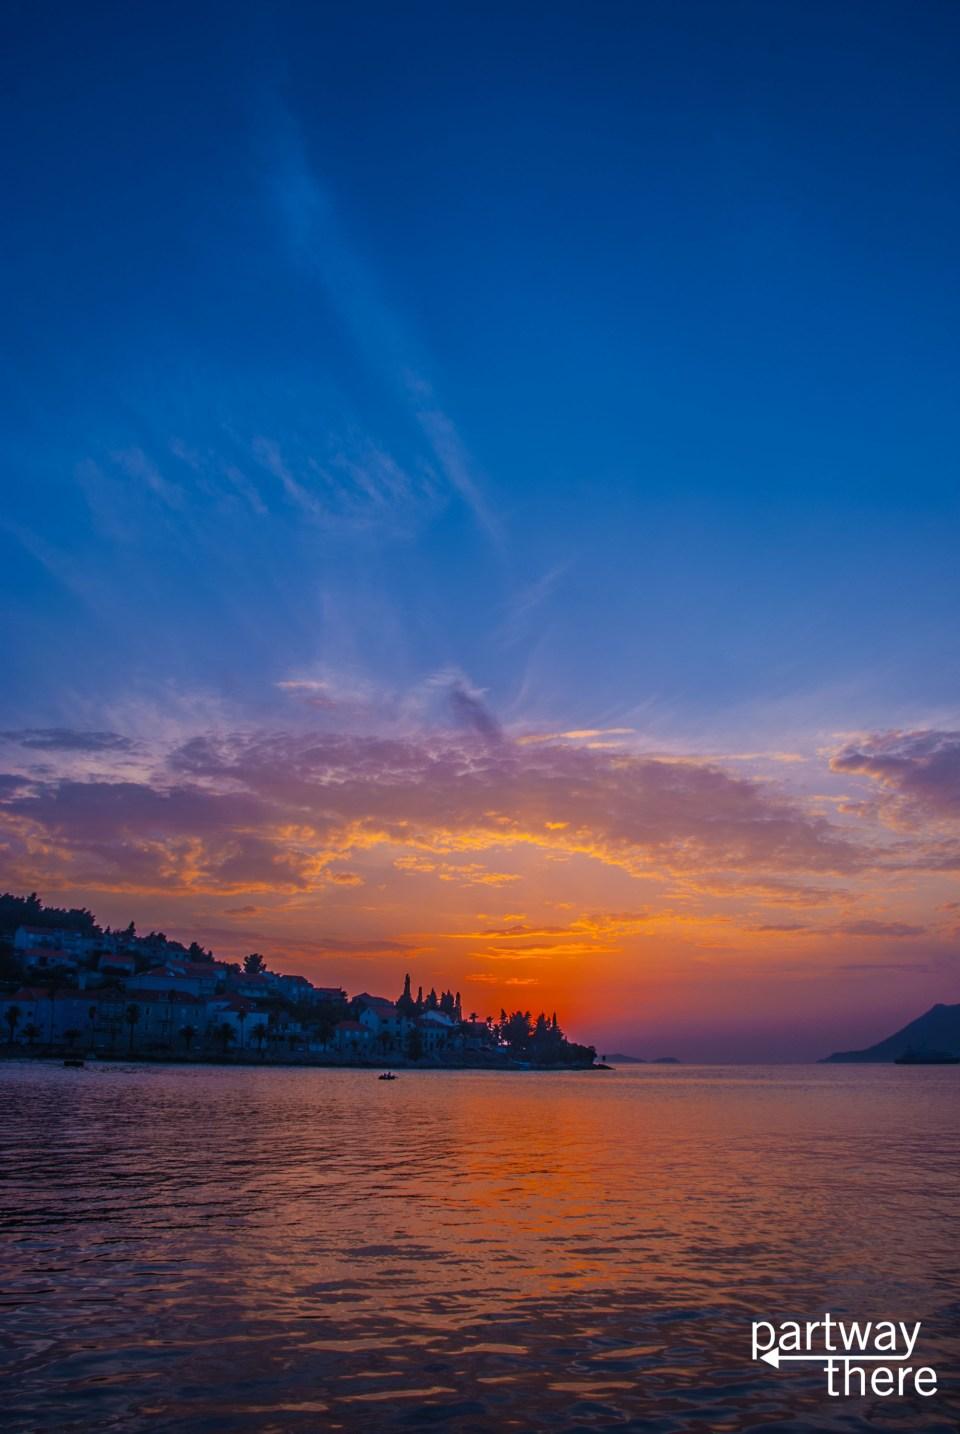 Sunset on Korcula